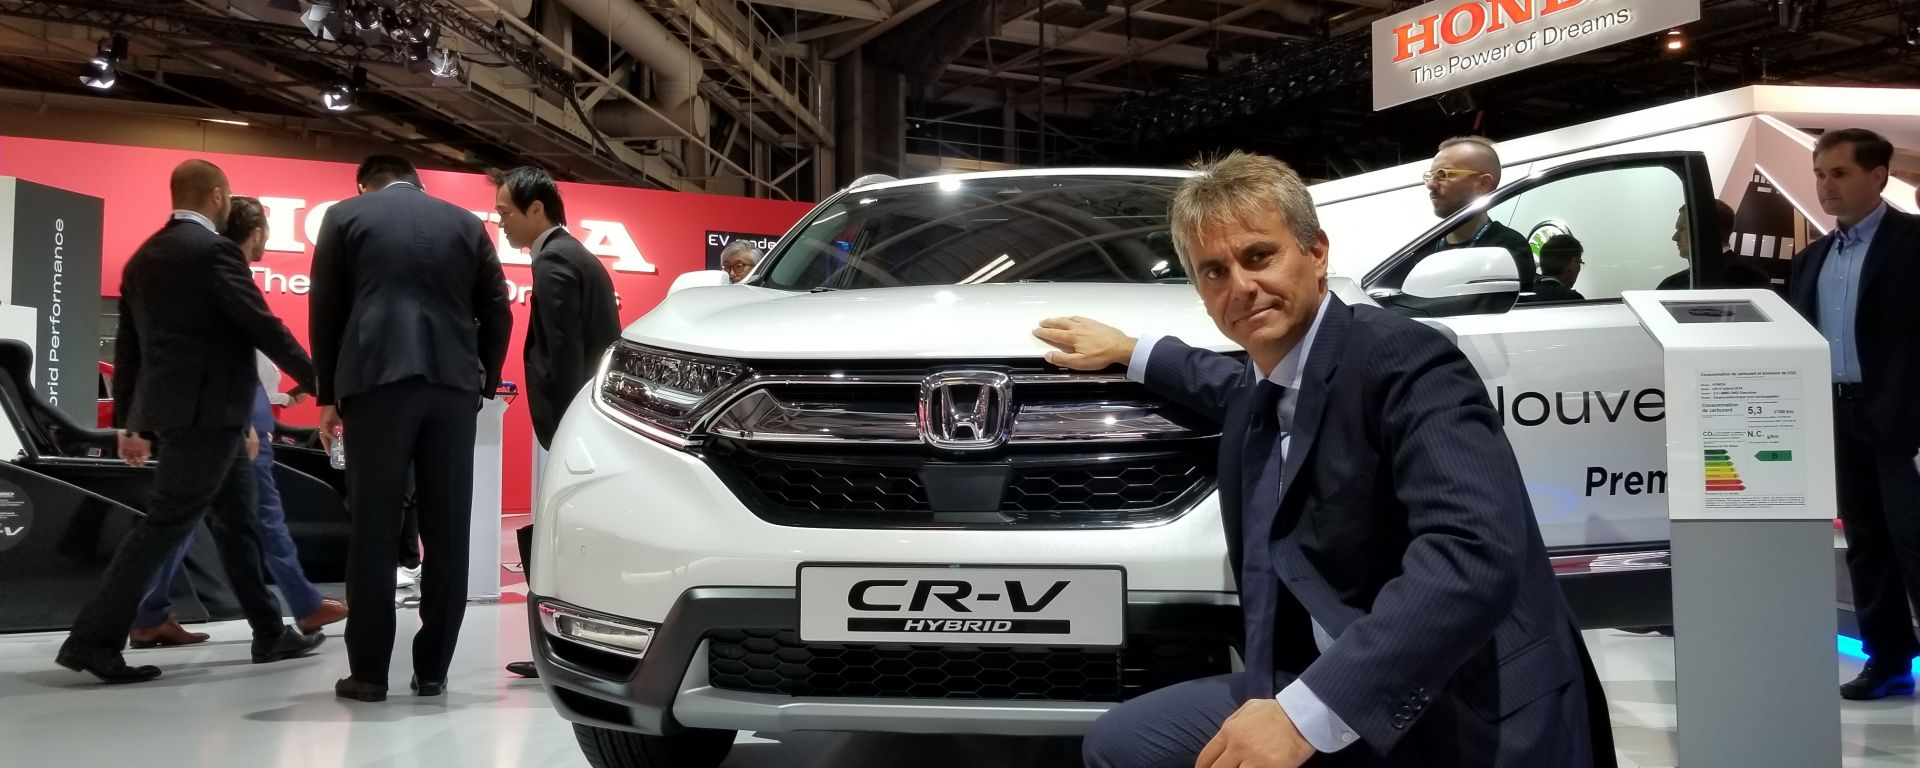 Novità Honda a Parigi 2018: intervista a Vincenzo Picardi